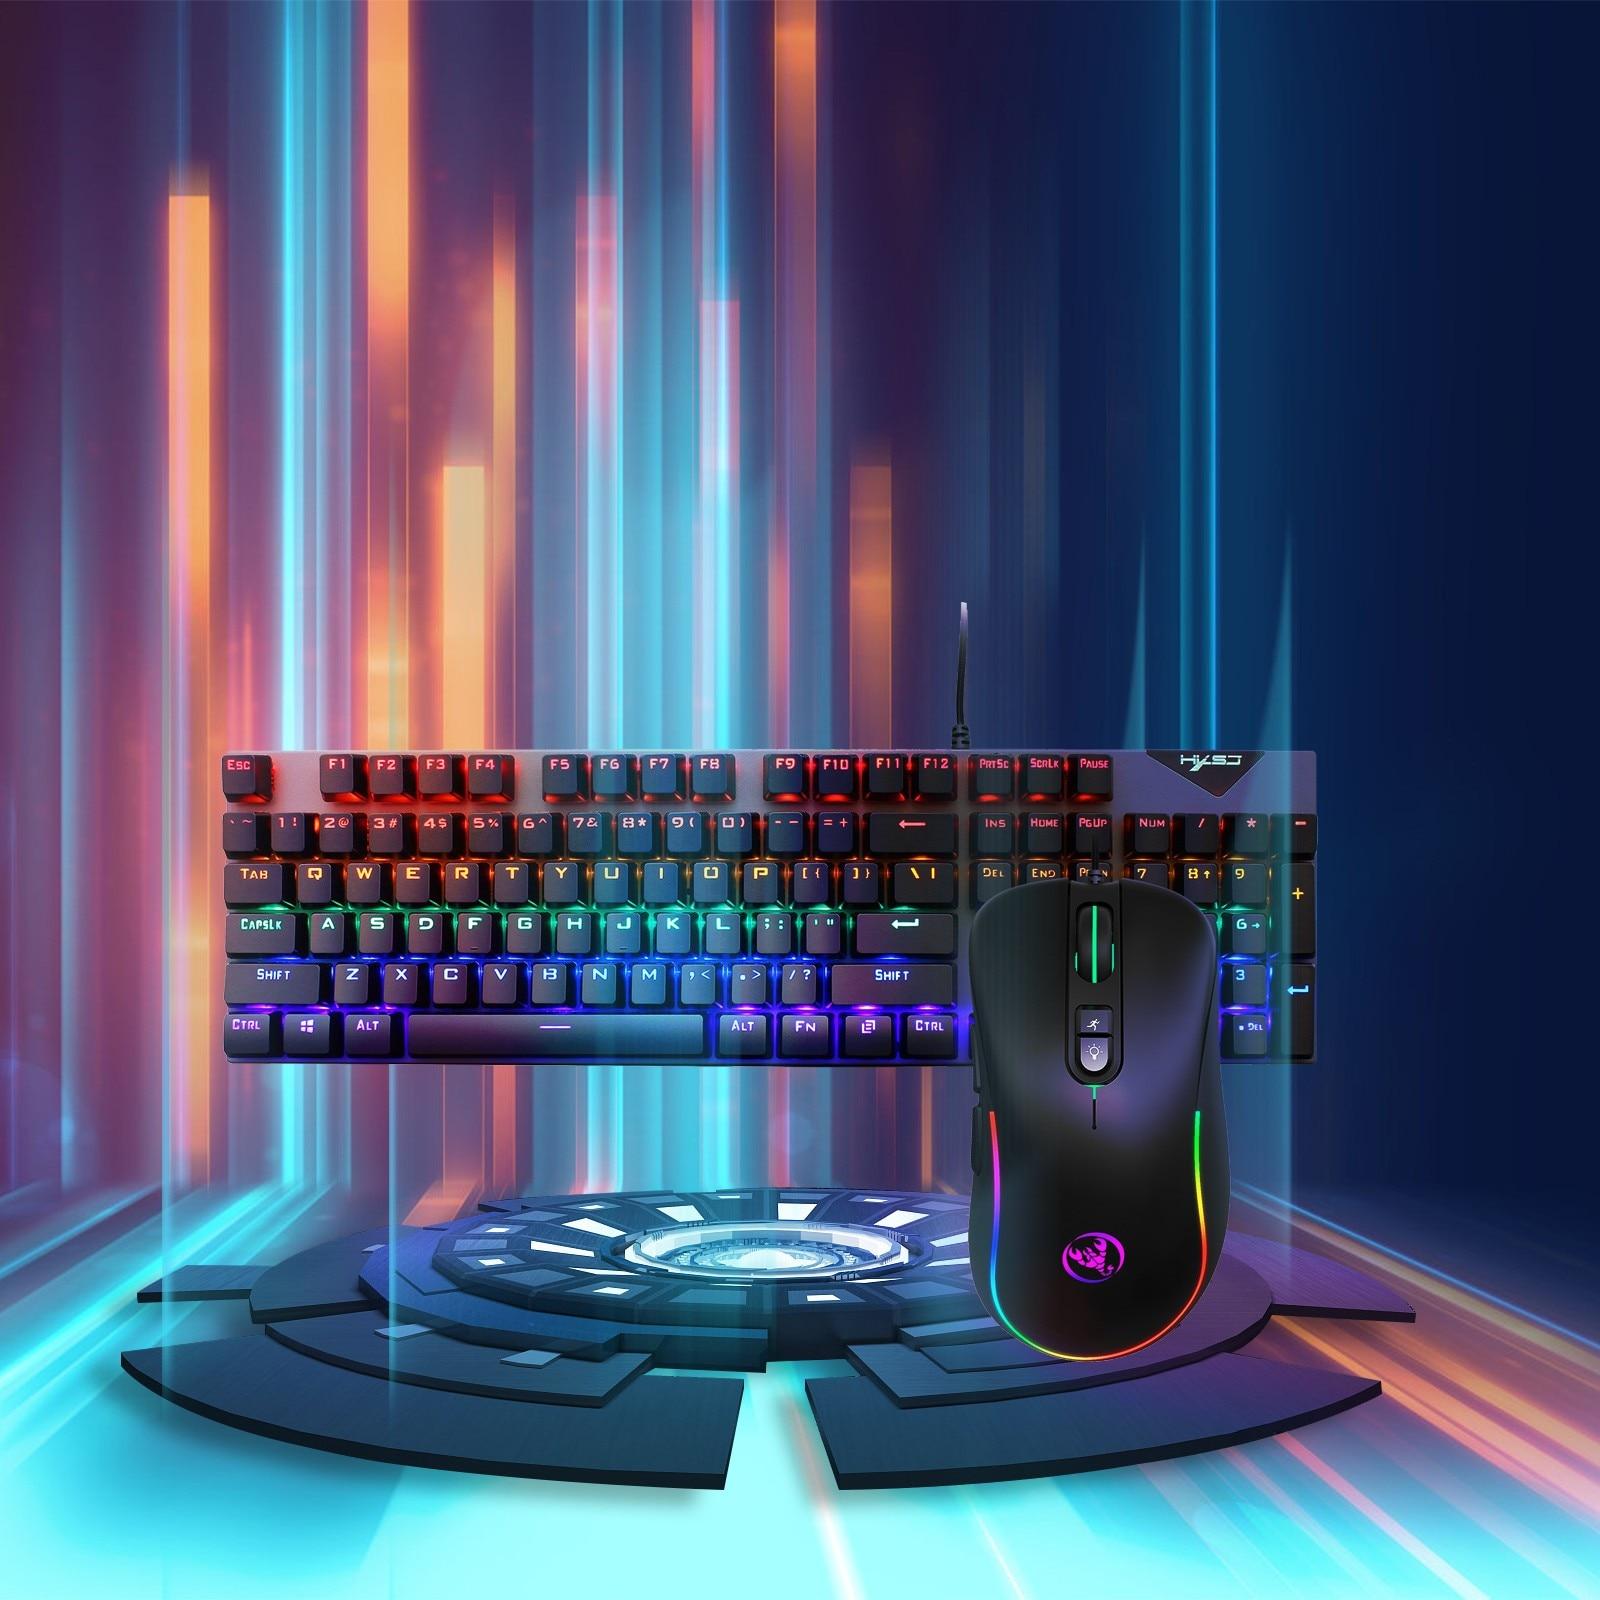 L300 + j300 104-key Rgb مضيئة الميكانيكية لوحة مفاتيح وماوس مجموعة مكتب الترفيه ل حاسوب شخصي مكتبي ألعاب كمبيوتر محمول